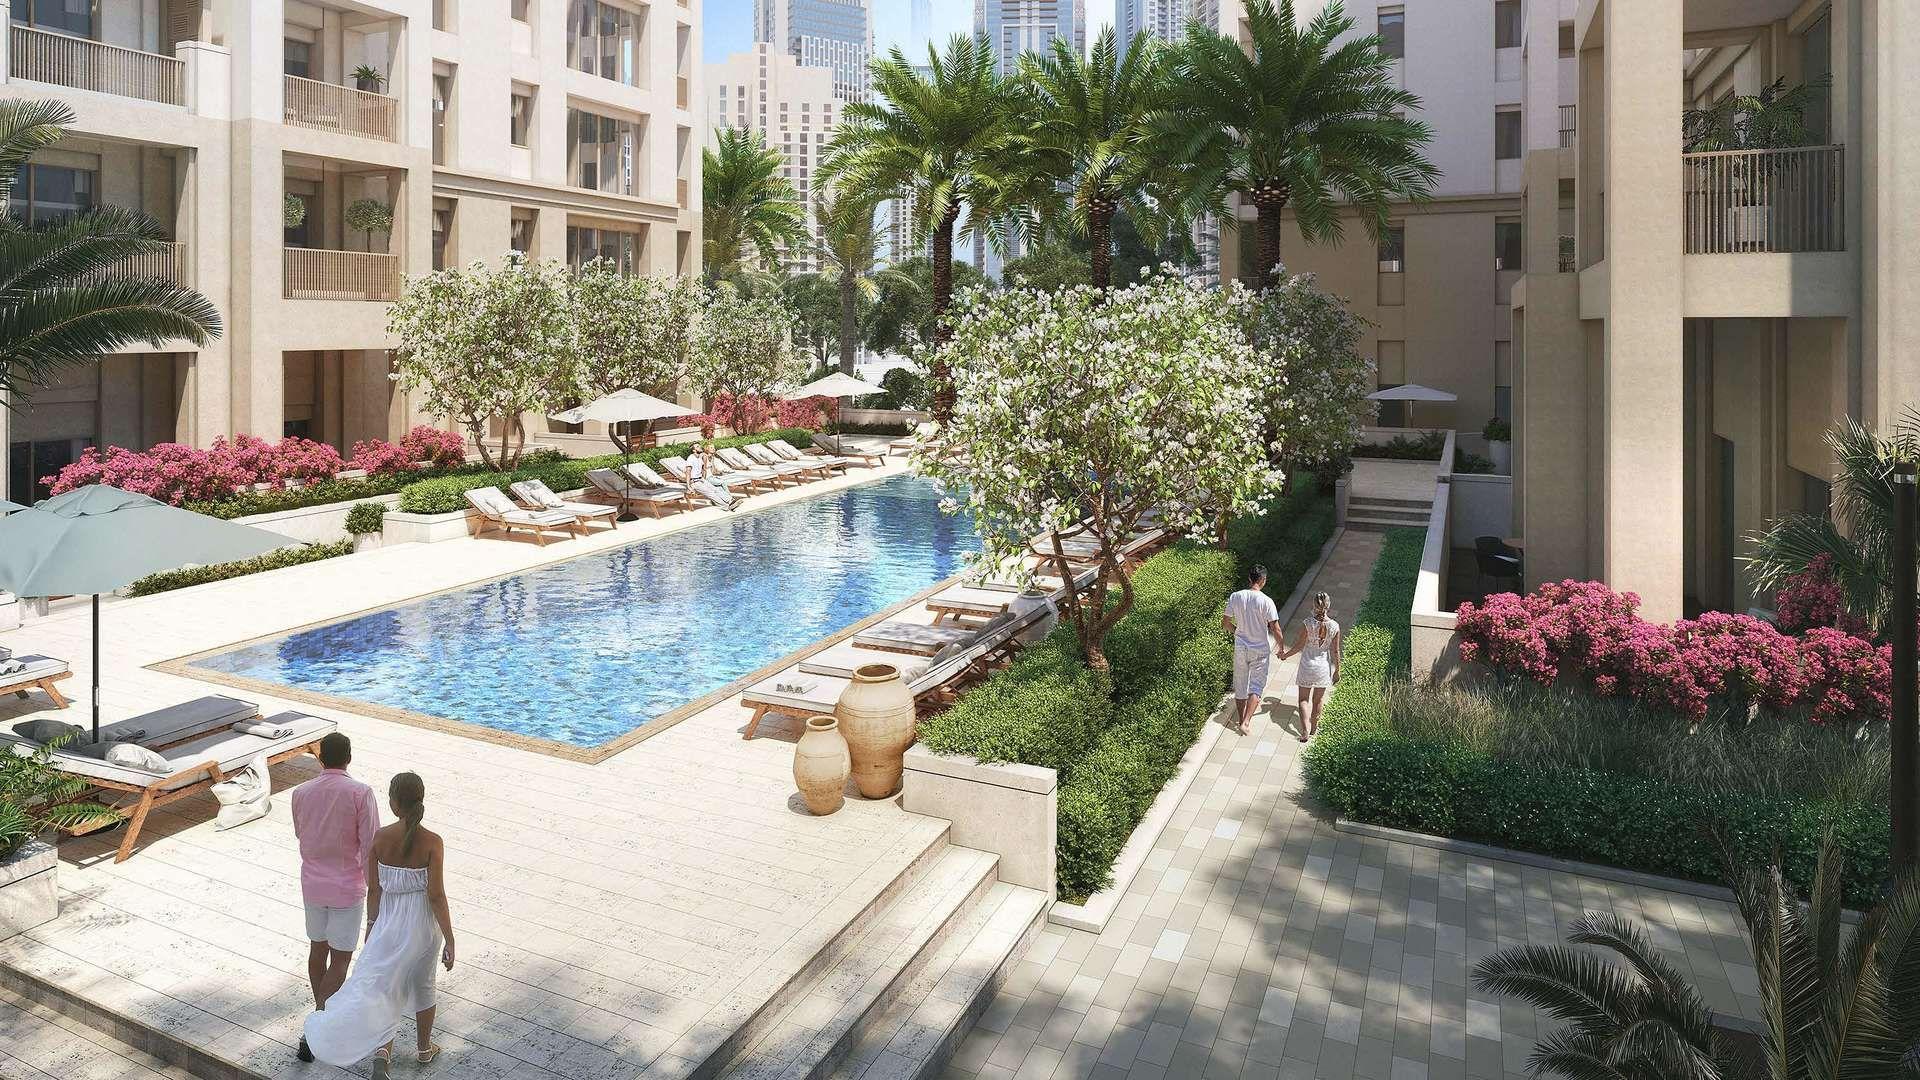 Apartments at the breez. #Apartment #Breez #Dubai ...